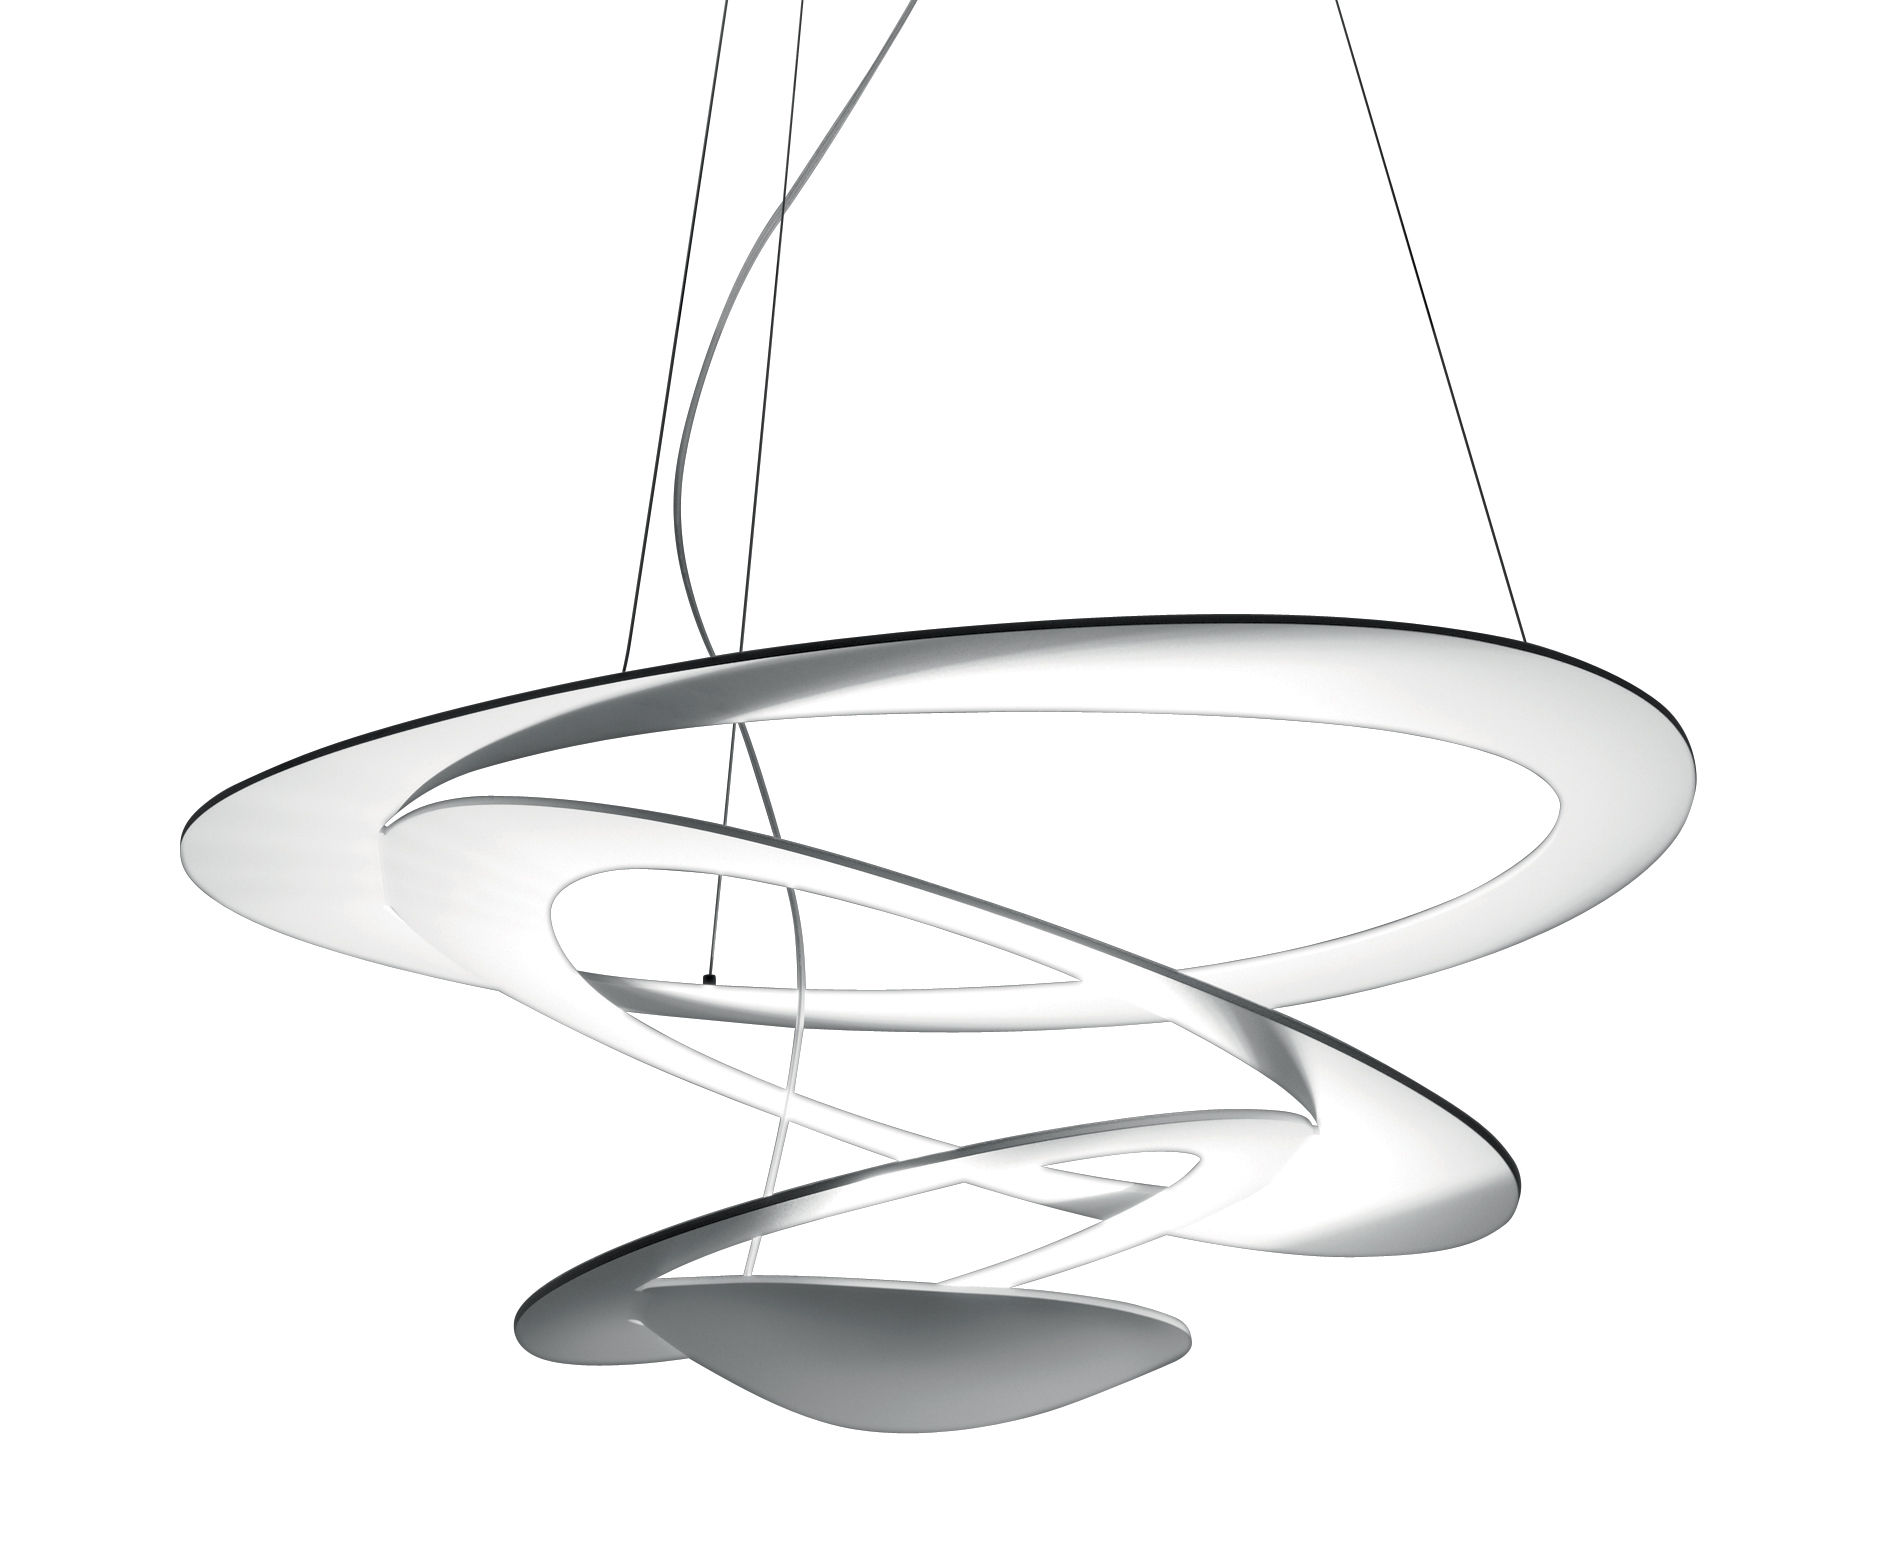 Leuchten - Pendelleuchten - Pirce Mini LED Pendelleuchte / Ø 69 cm - Artemide - Weiß - klarlackbeschichtetes Aluminium